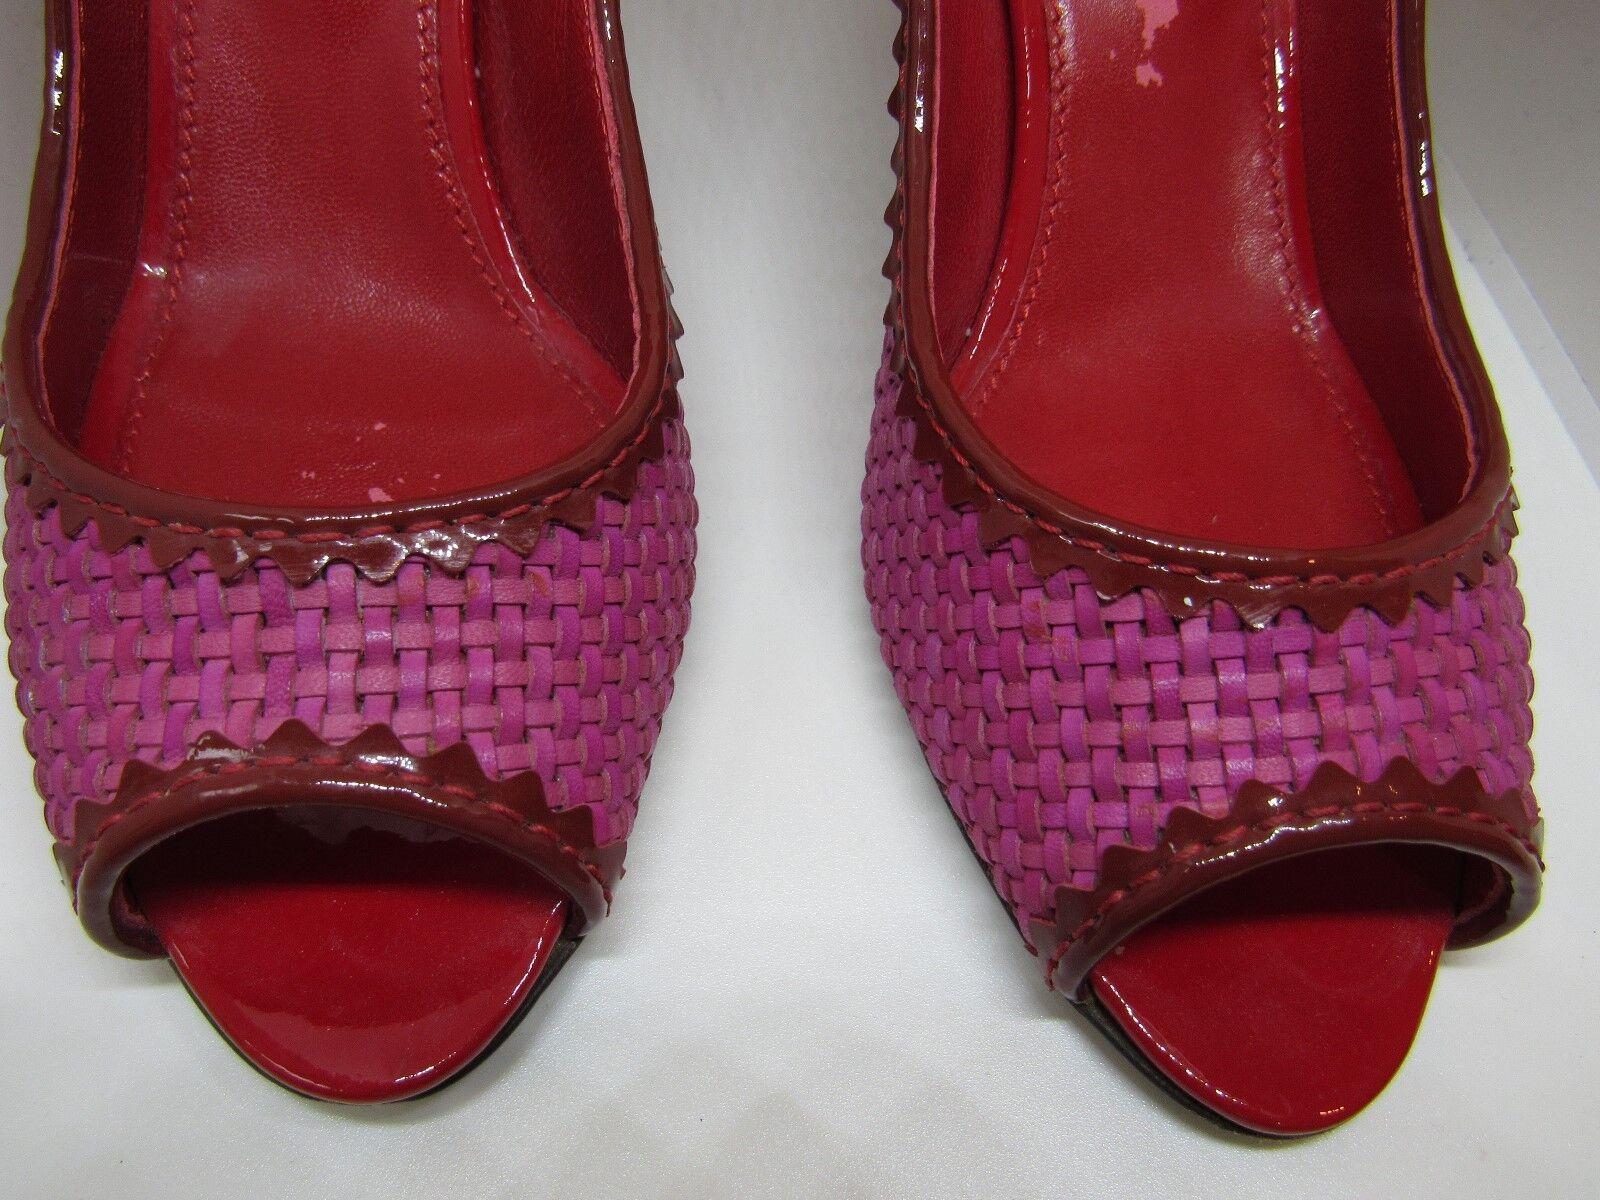 Sergio Rossi Pink ROT Woven Peep Toe Heel Pumps Pumps Pumps Größe EU 36 b71fb6